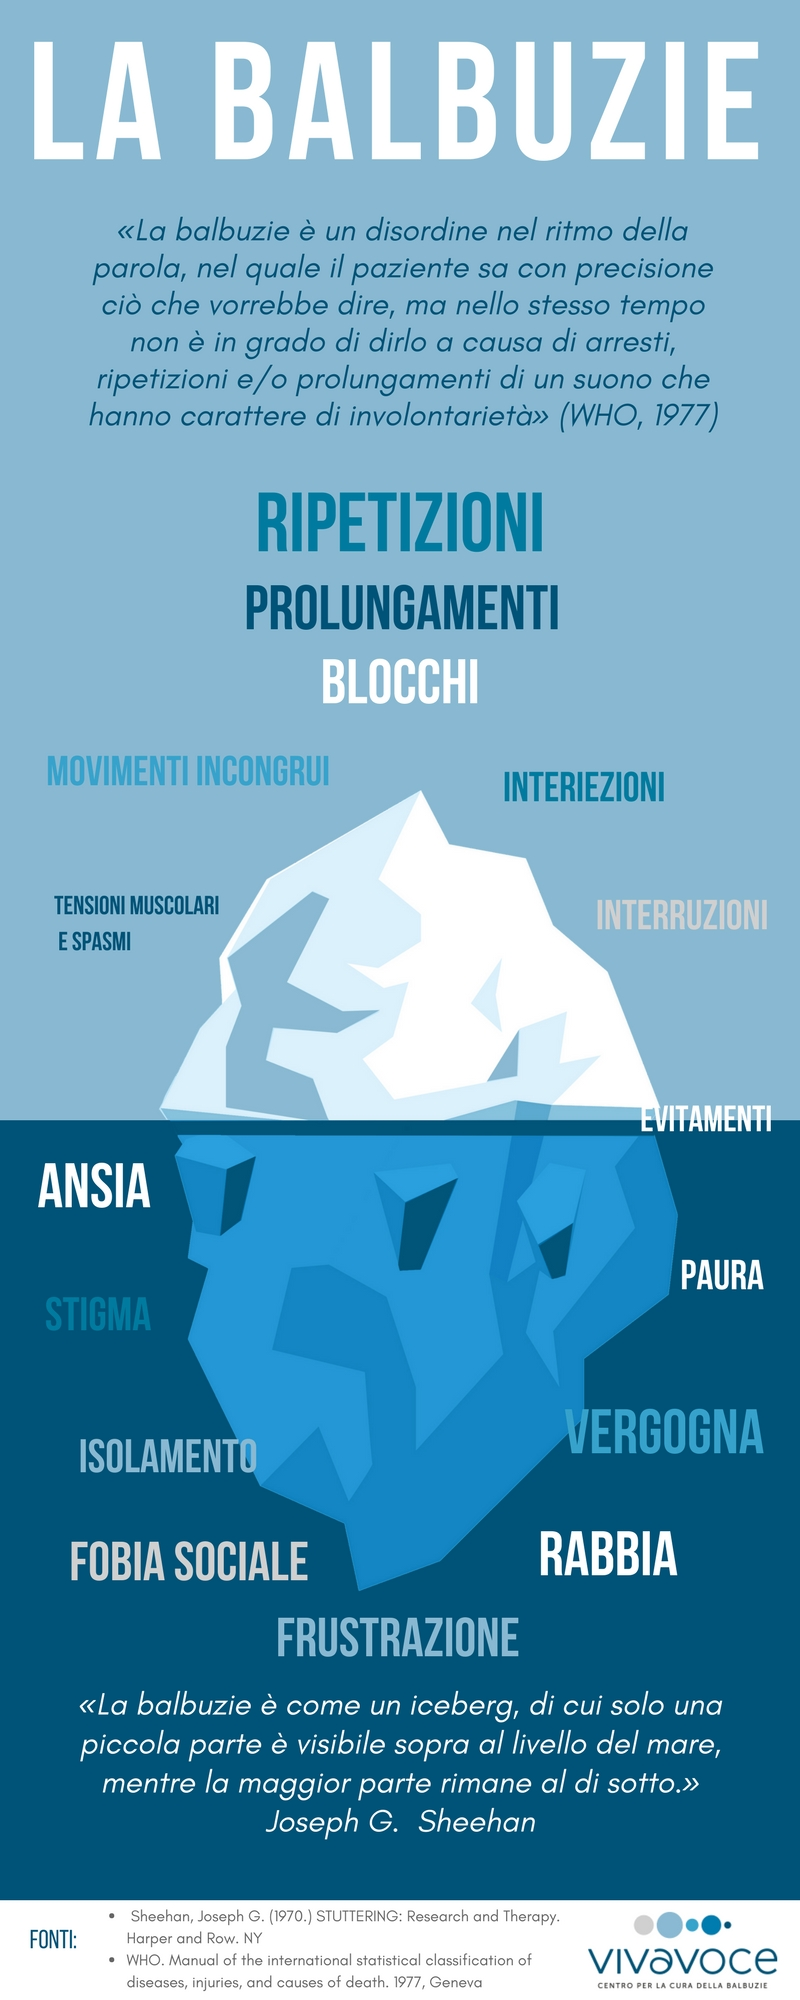 Iceberg della balbuzie - infografica - Vivavoce